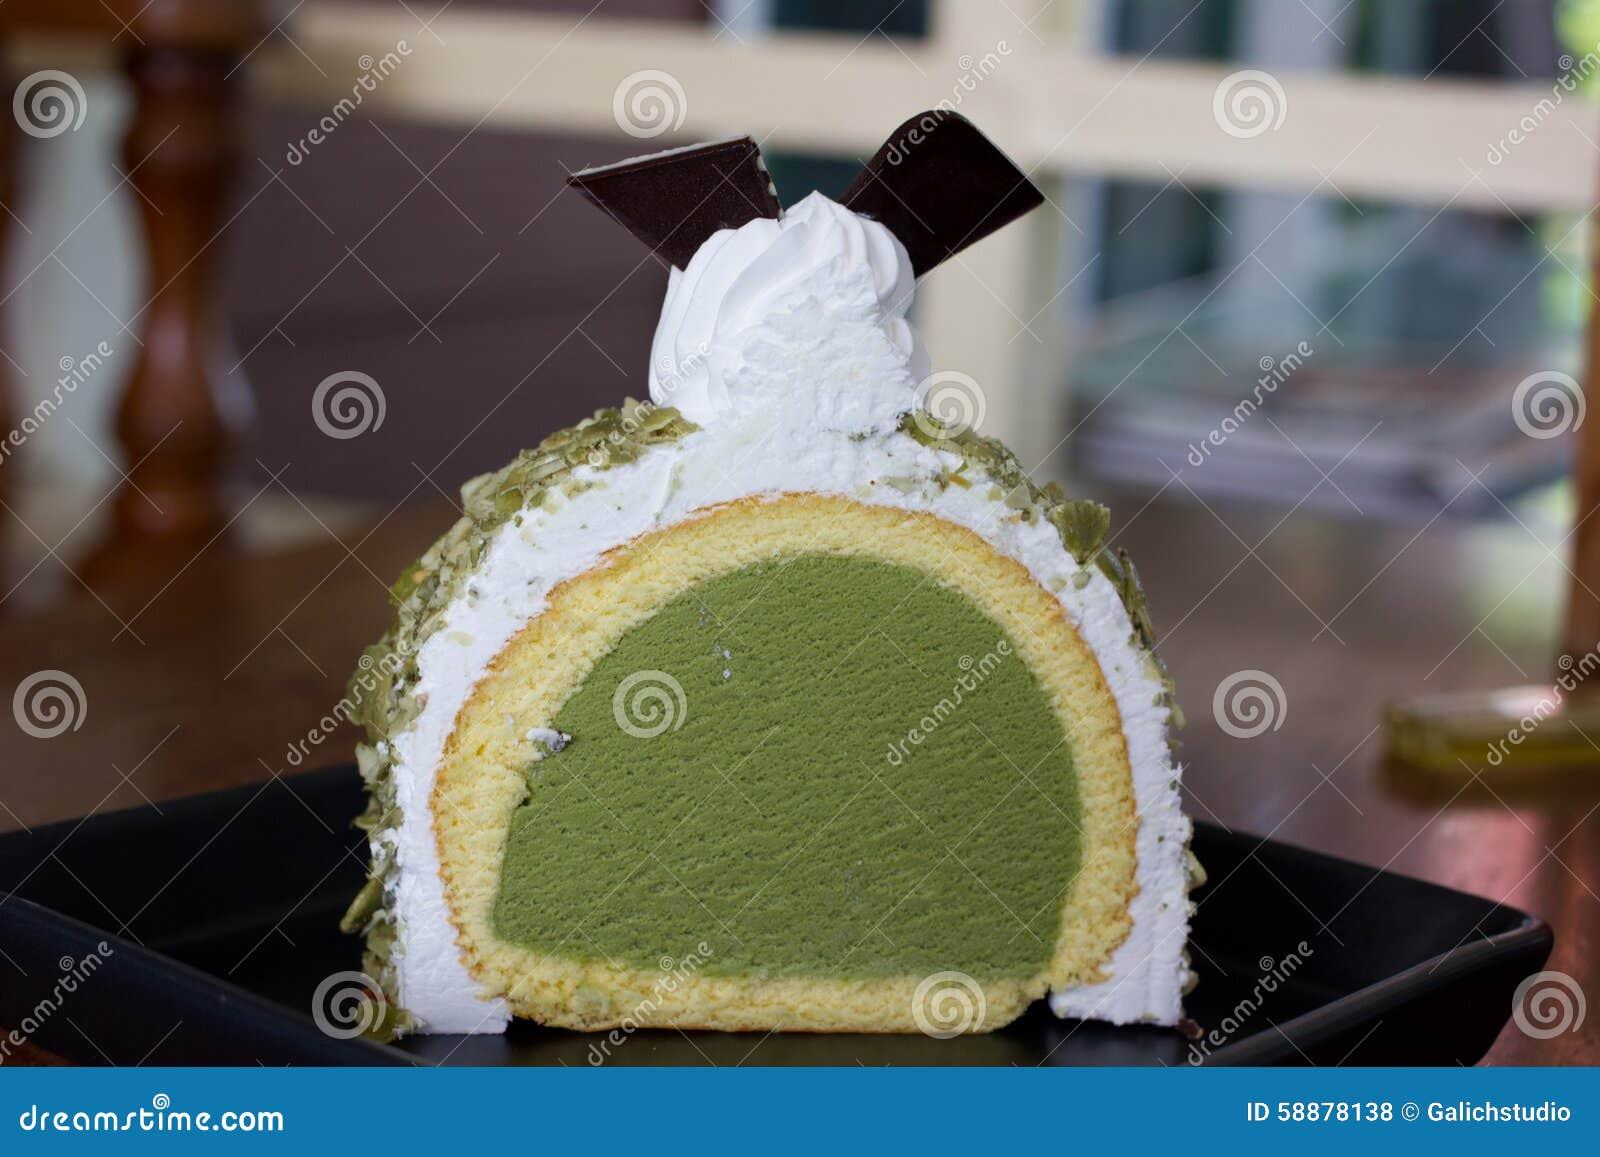 greentea icecream cake on wood table stock photo image of